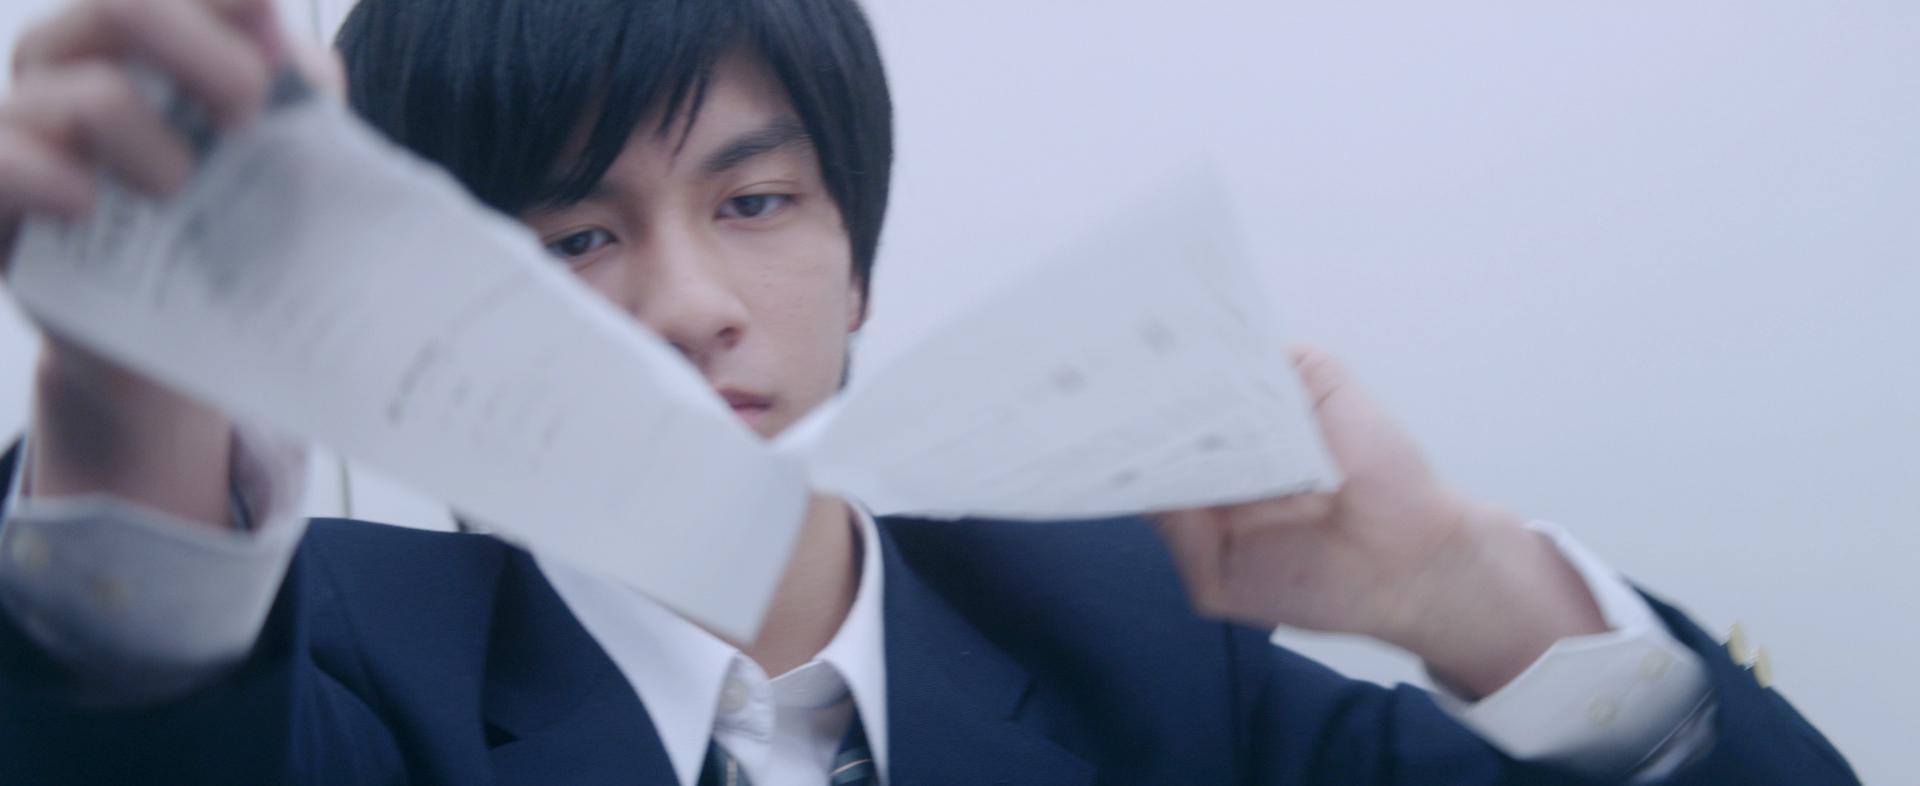 YouTubeで「感動的」「泣ける」と話題の動画のフルストーリー版が完成!「おしえるしごと、おそわるしごと~紙をやぶく少年~」(主演:朝倉あき、田中偉登)を4月23日(木)より公開いたしました。